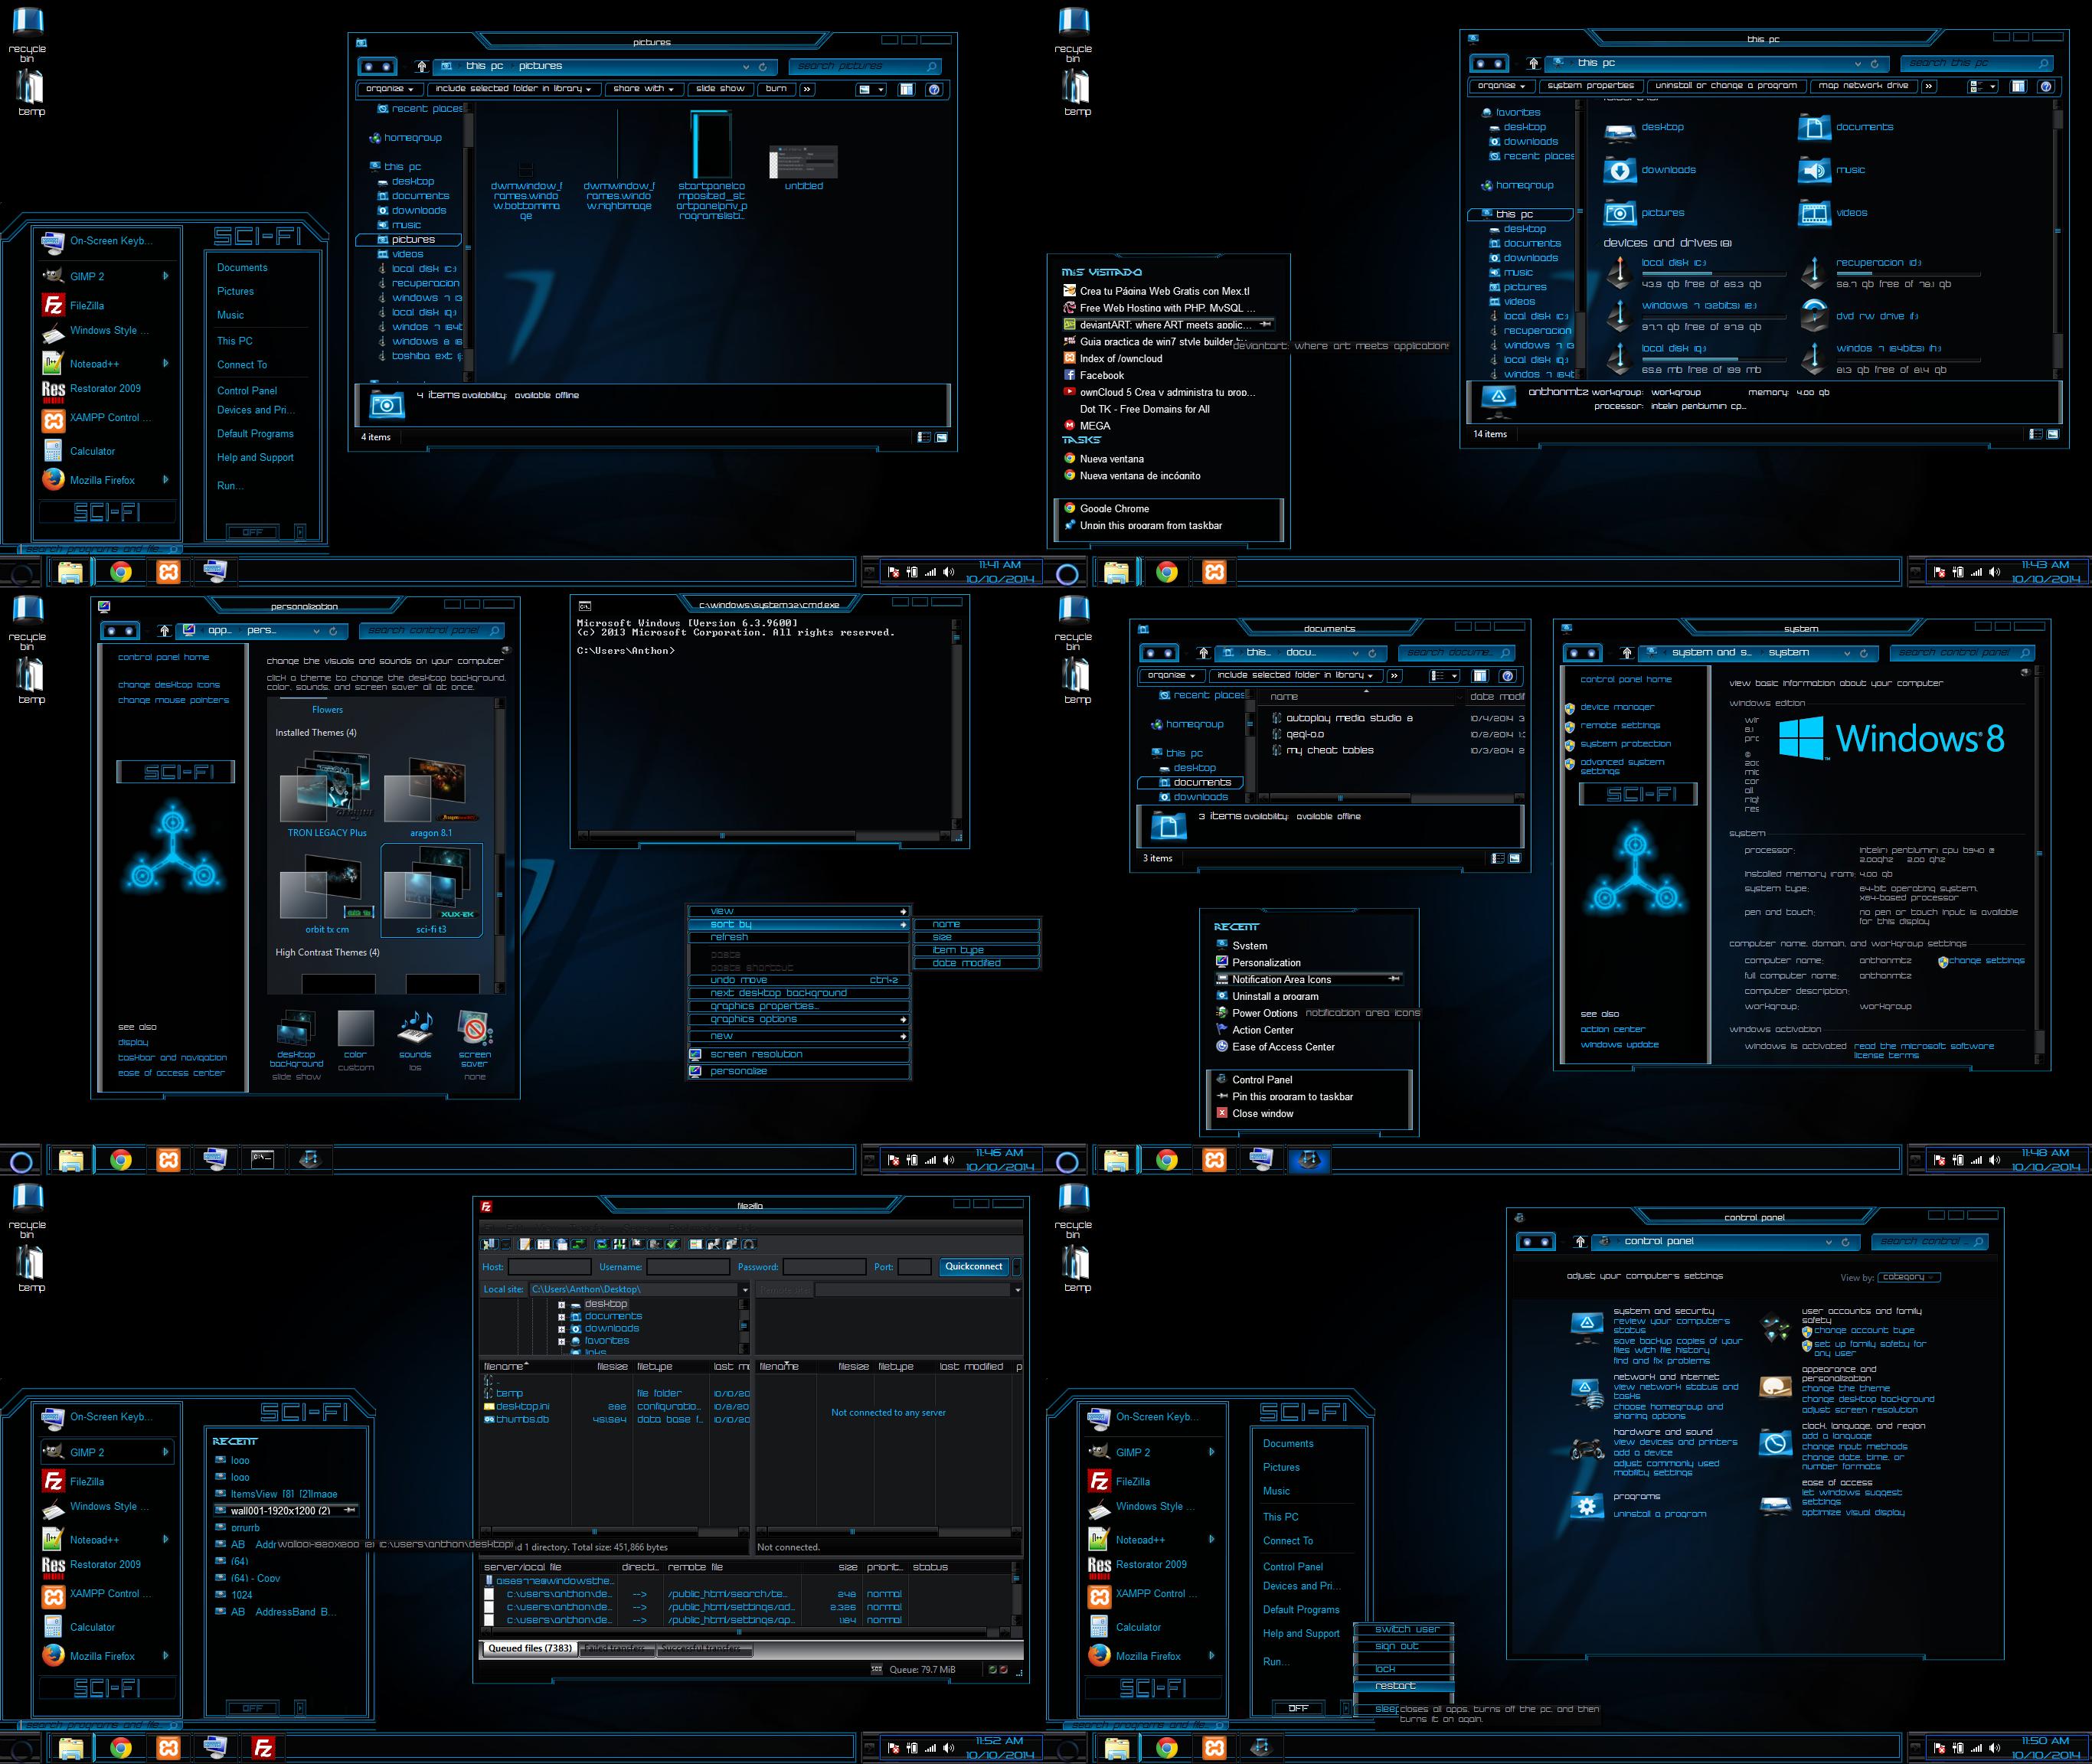 Windows Xp Theme File Software: Windows 8.1 Theme New Sci-fi By Tono3022 On DeviantArt